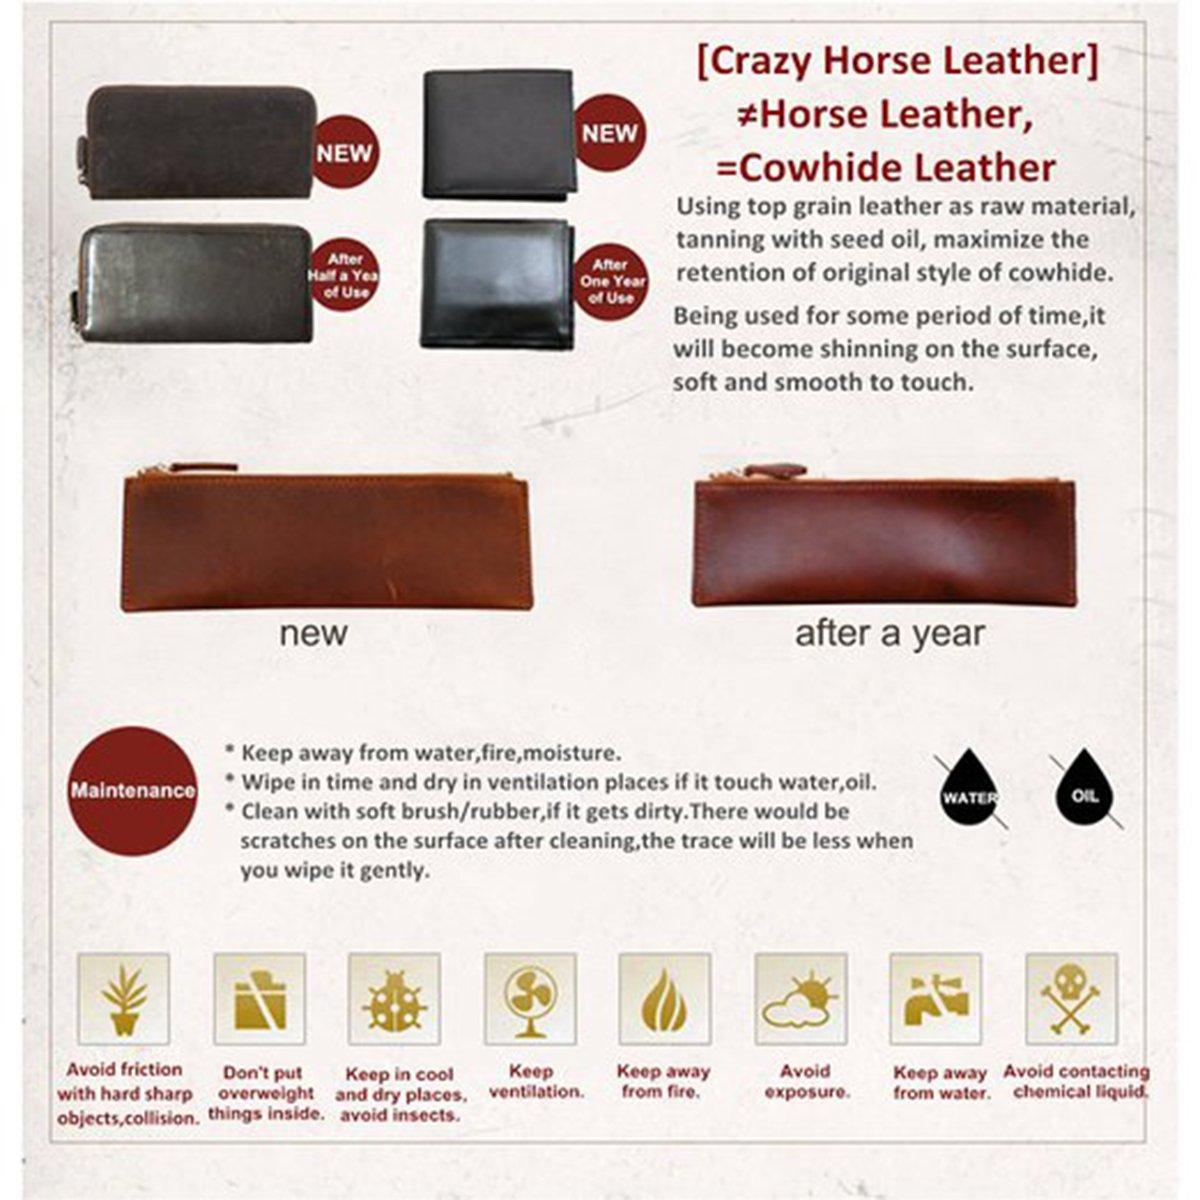 Huntvp Mens Leather Travel Duffel Bag Vintage Weekender Carry On Brown Luggage Bag by Huntvp (Image #7)